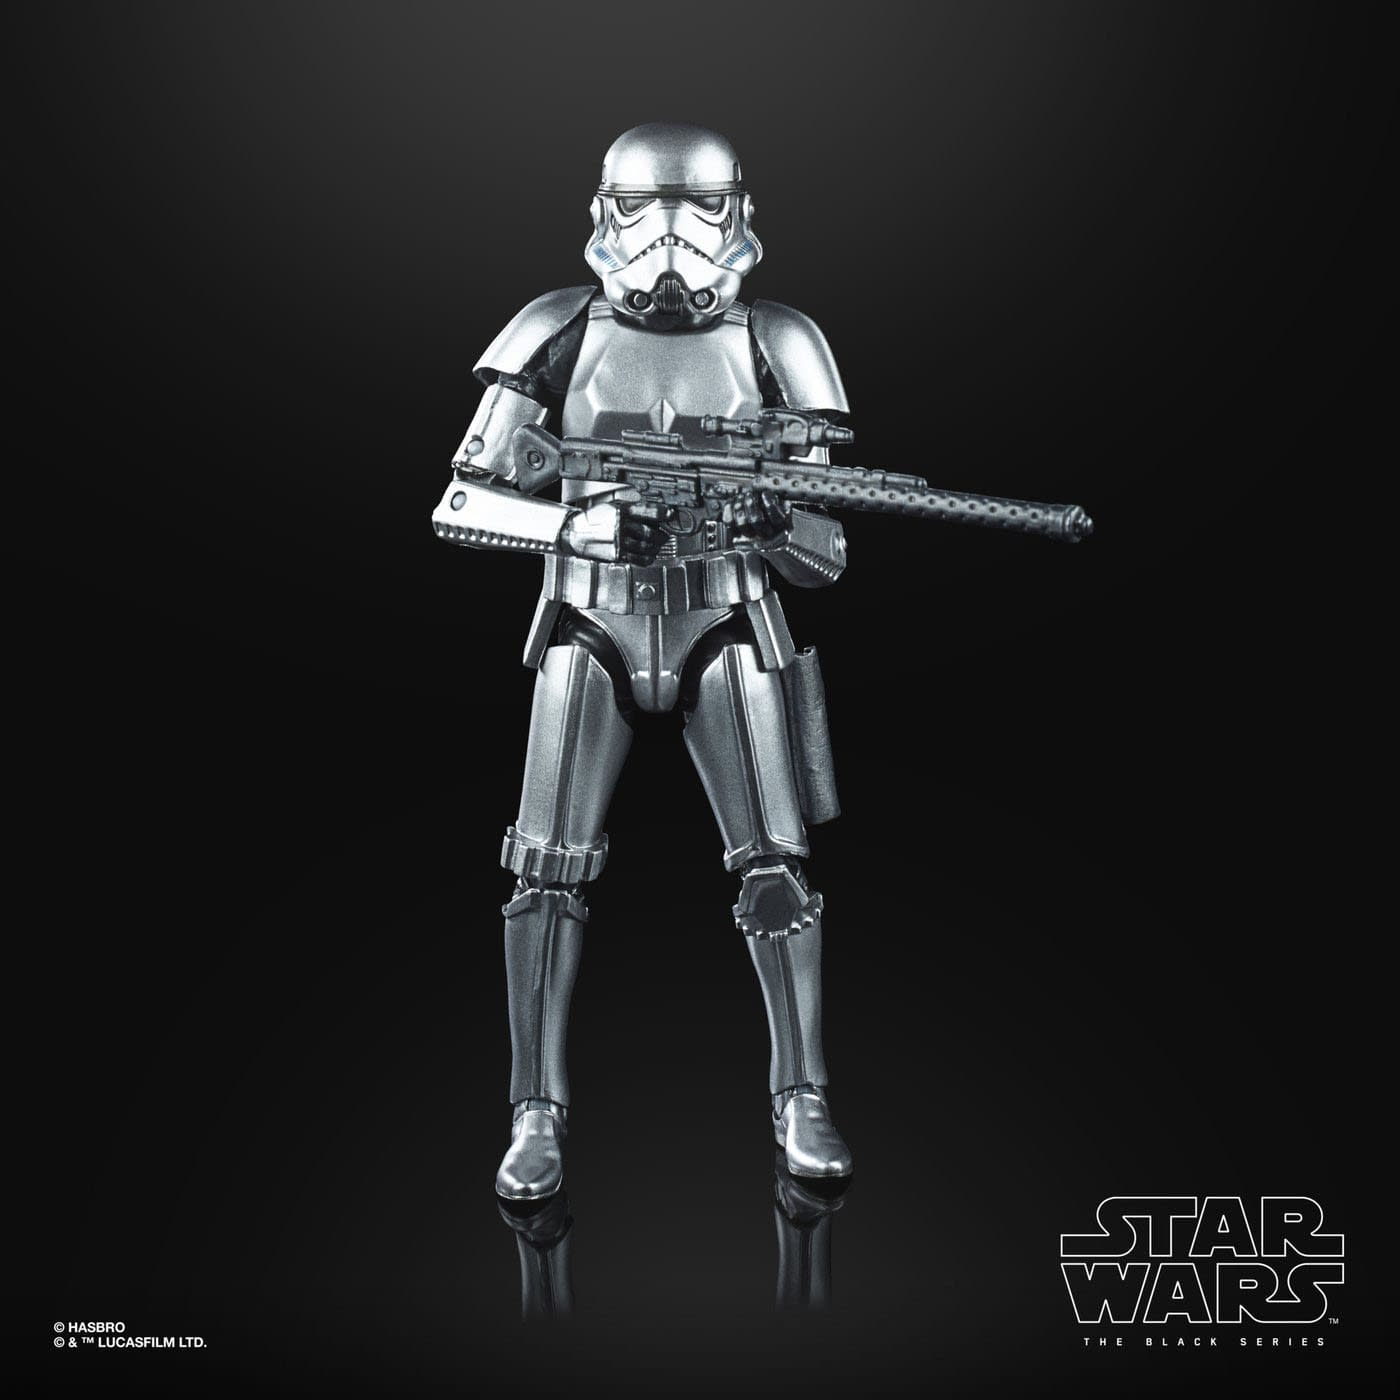 Star-Wars-Black-Series-Carbonized-Stormtrooper-003